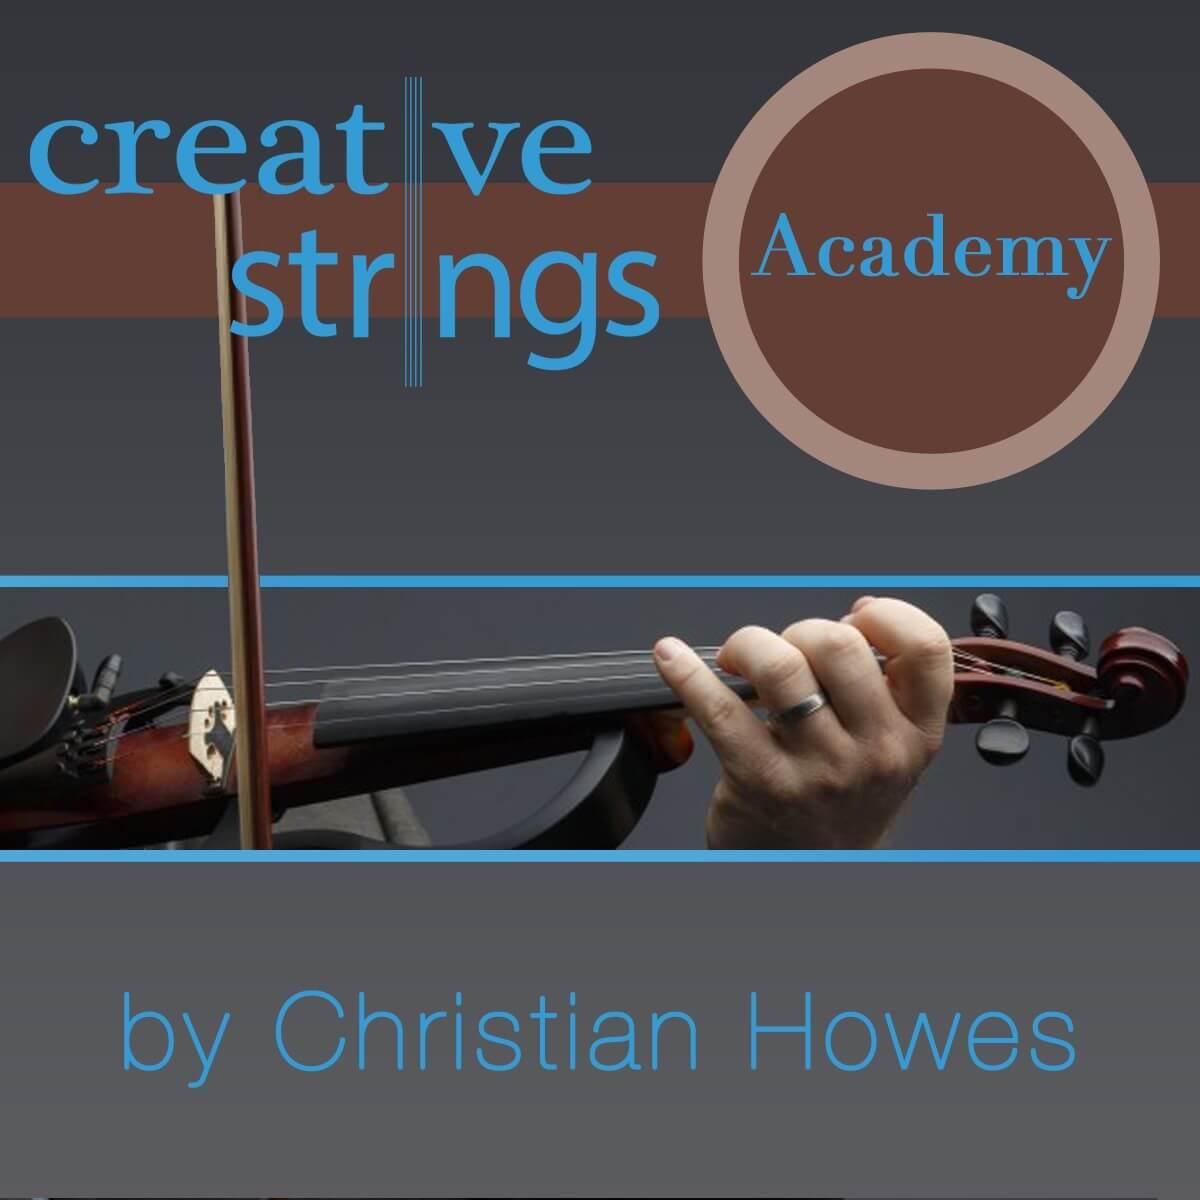 Creative Strings Academy Membership